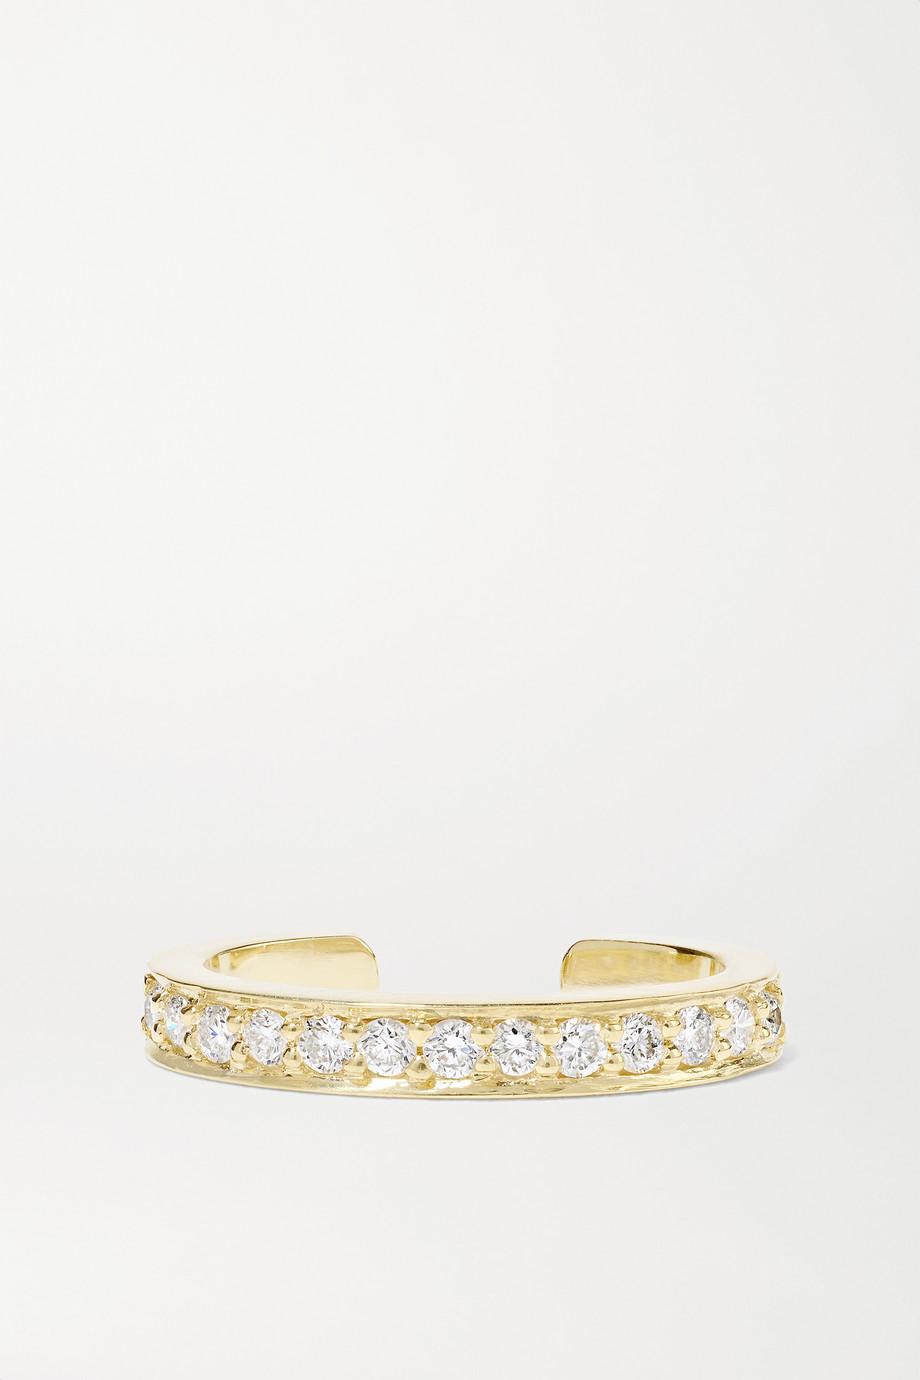 Anita Ko Bijou d'oreille en or 18carats (750/1000) et diamants